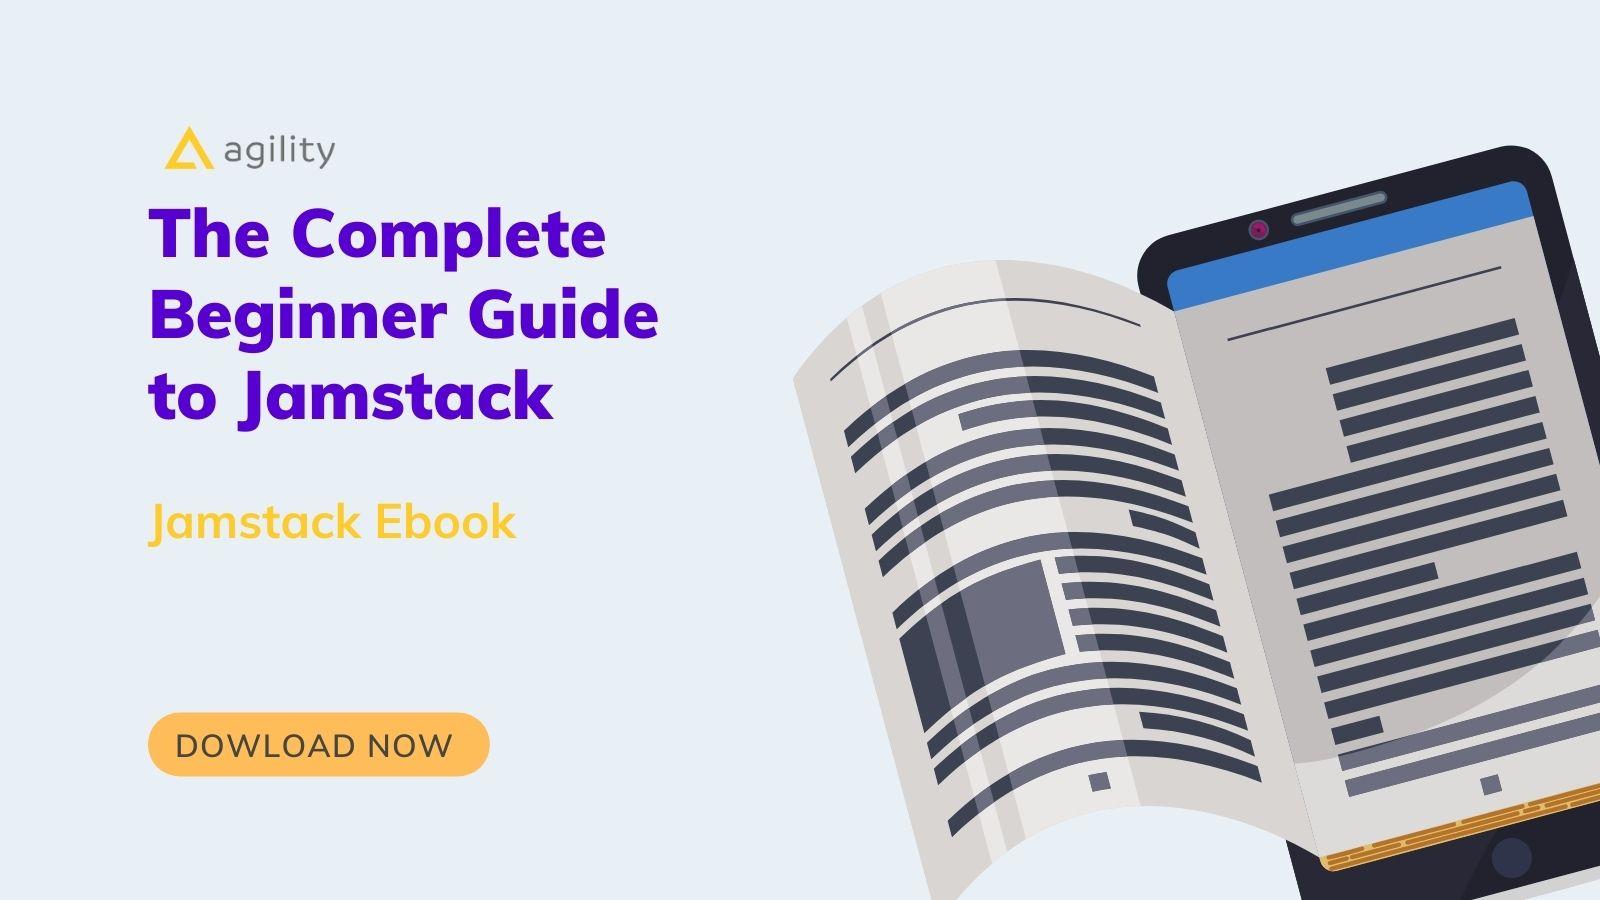 Jamstack Ebook on agility CMS